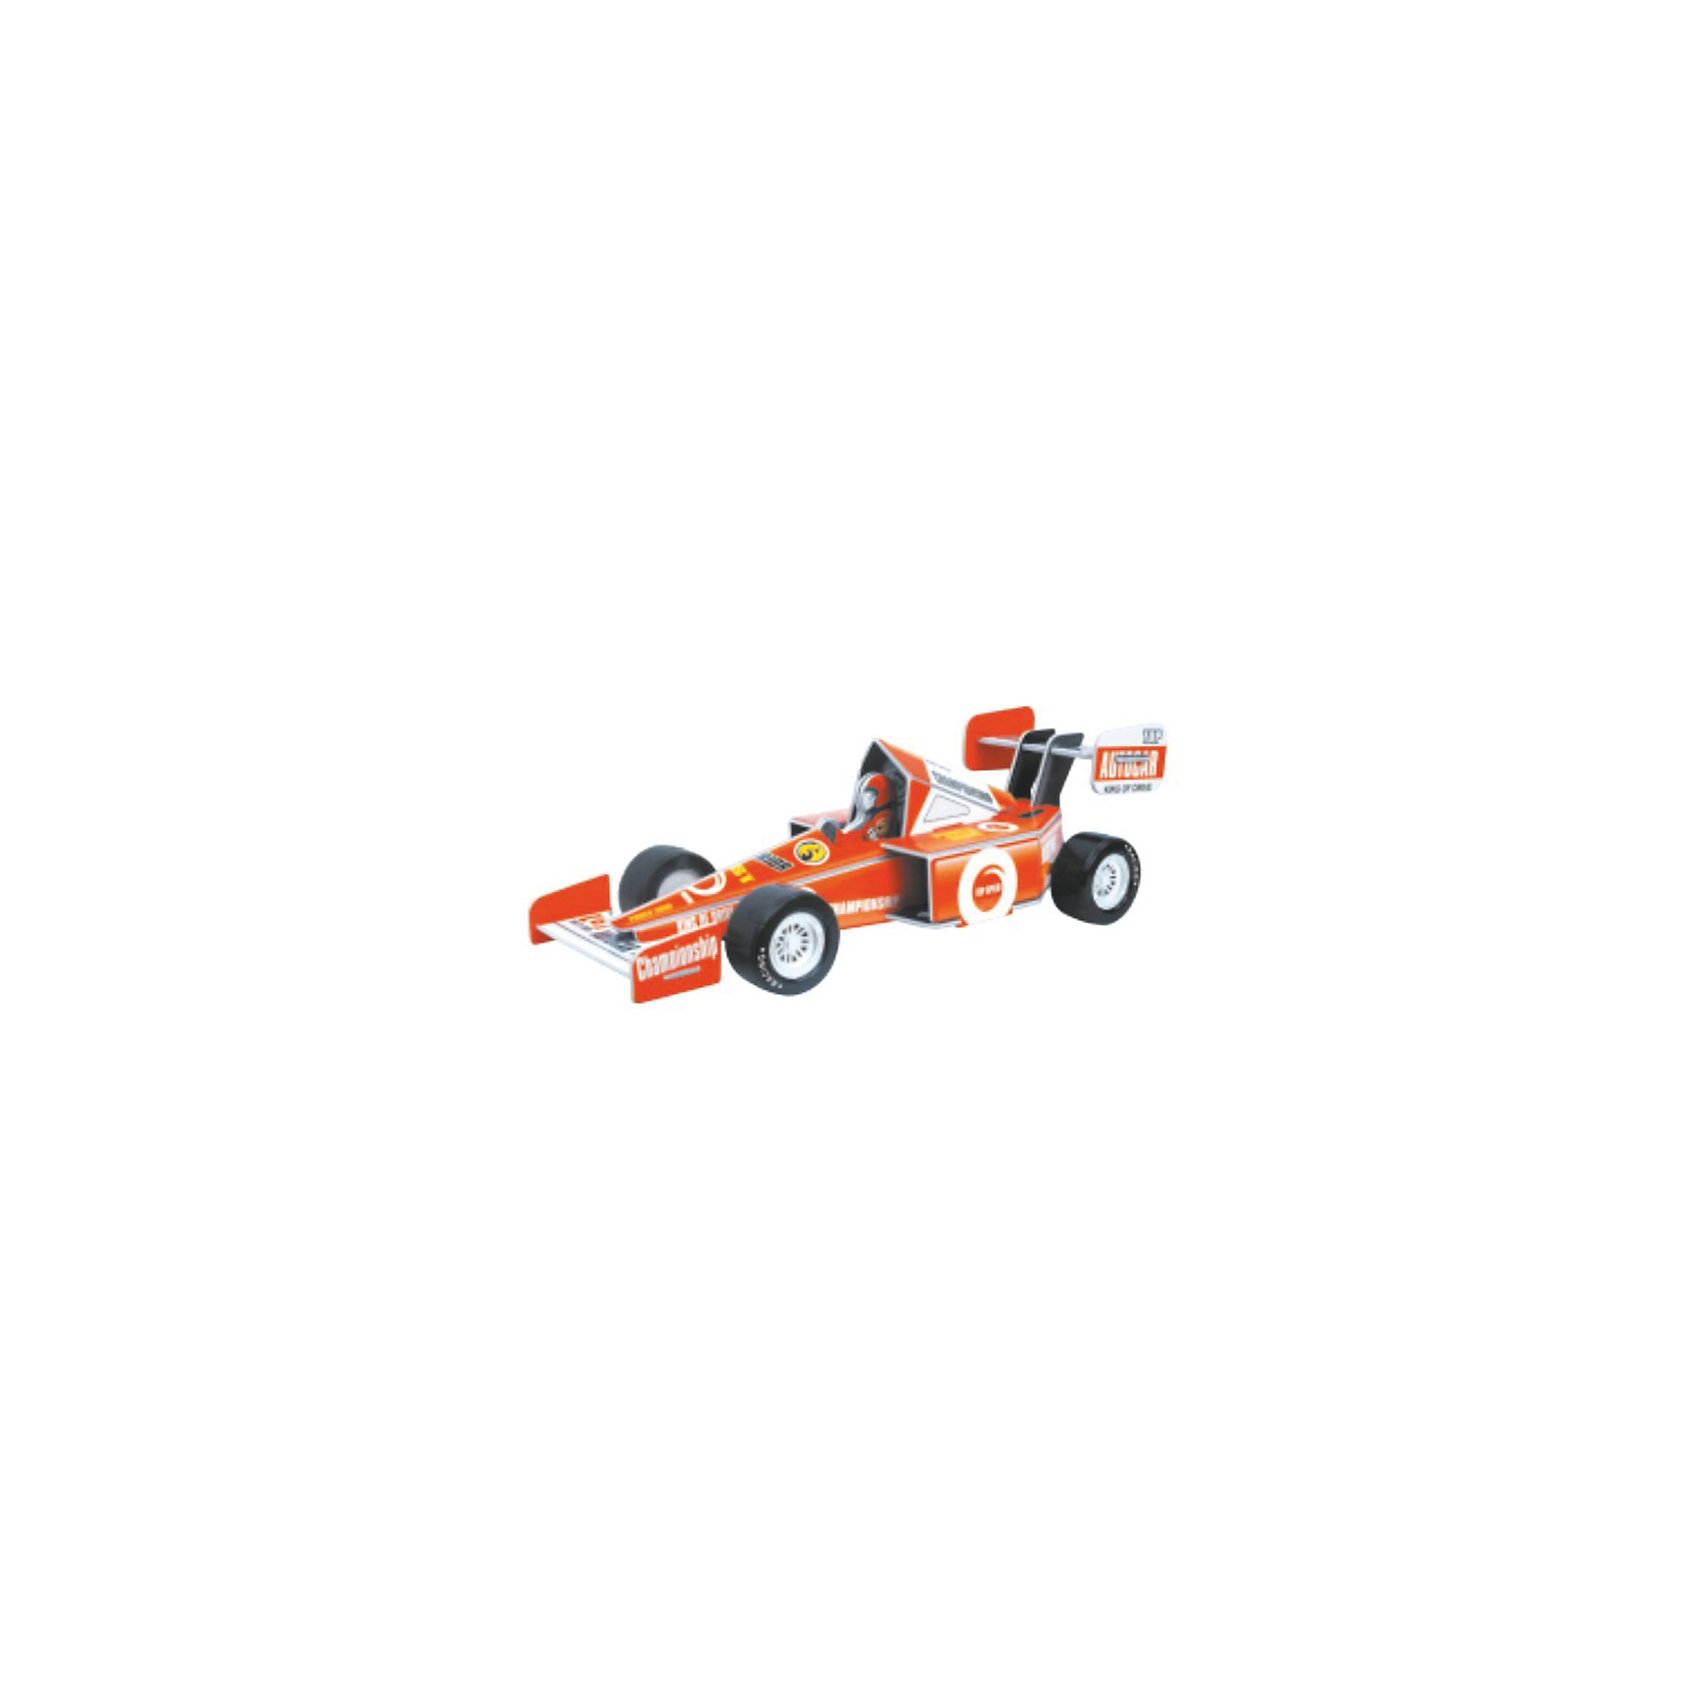 Конструктор-3D Гоночная Машинка XL, красная<br><br>Ширина мм: 77<br>Глубина мм: 35<br>Высота мм: 77<br>Вес г: 307<br>Возраст от месяцев: 36<br>Возраст до месяцев: 2147483647<br>Пол: Унисекс<br>Возраст: Детский<br>SKU: 5362964